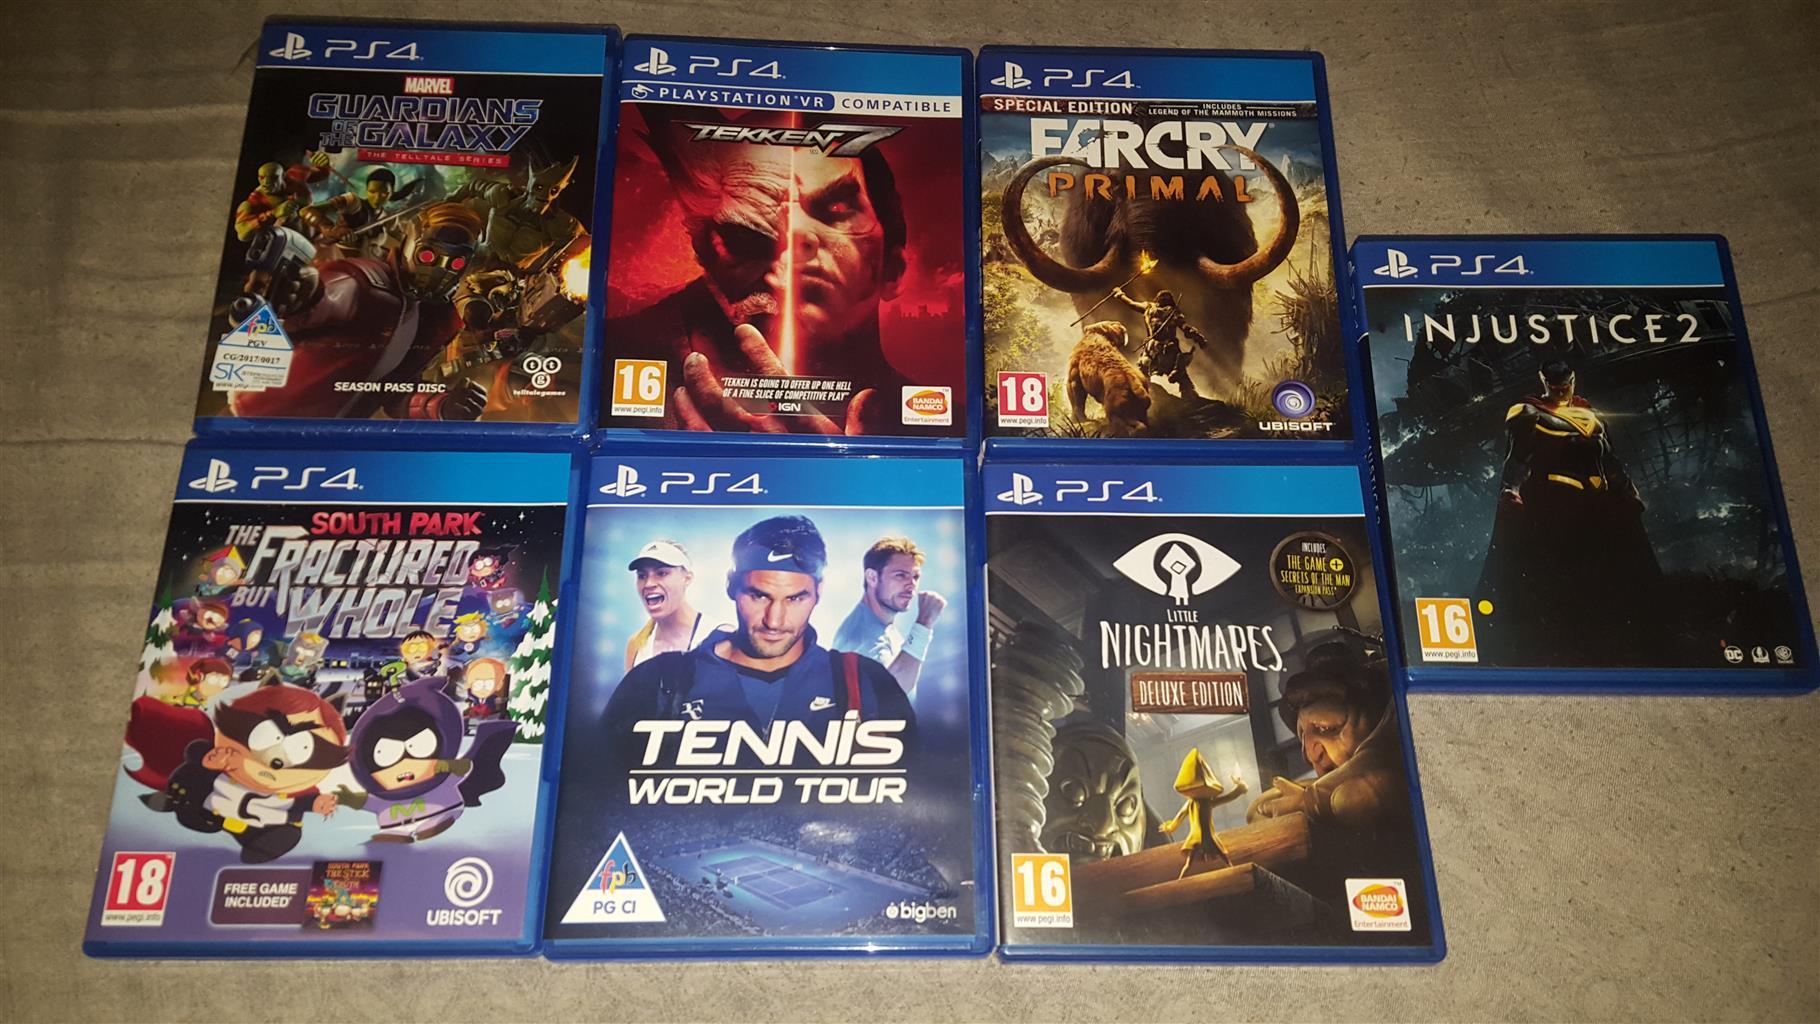 jogos da PlayStation